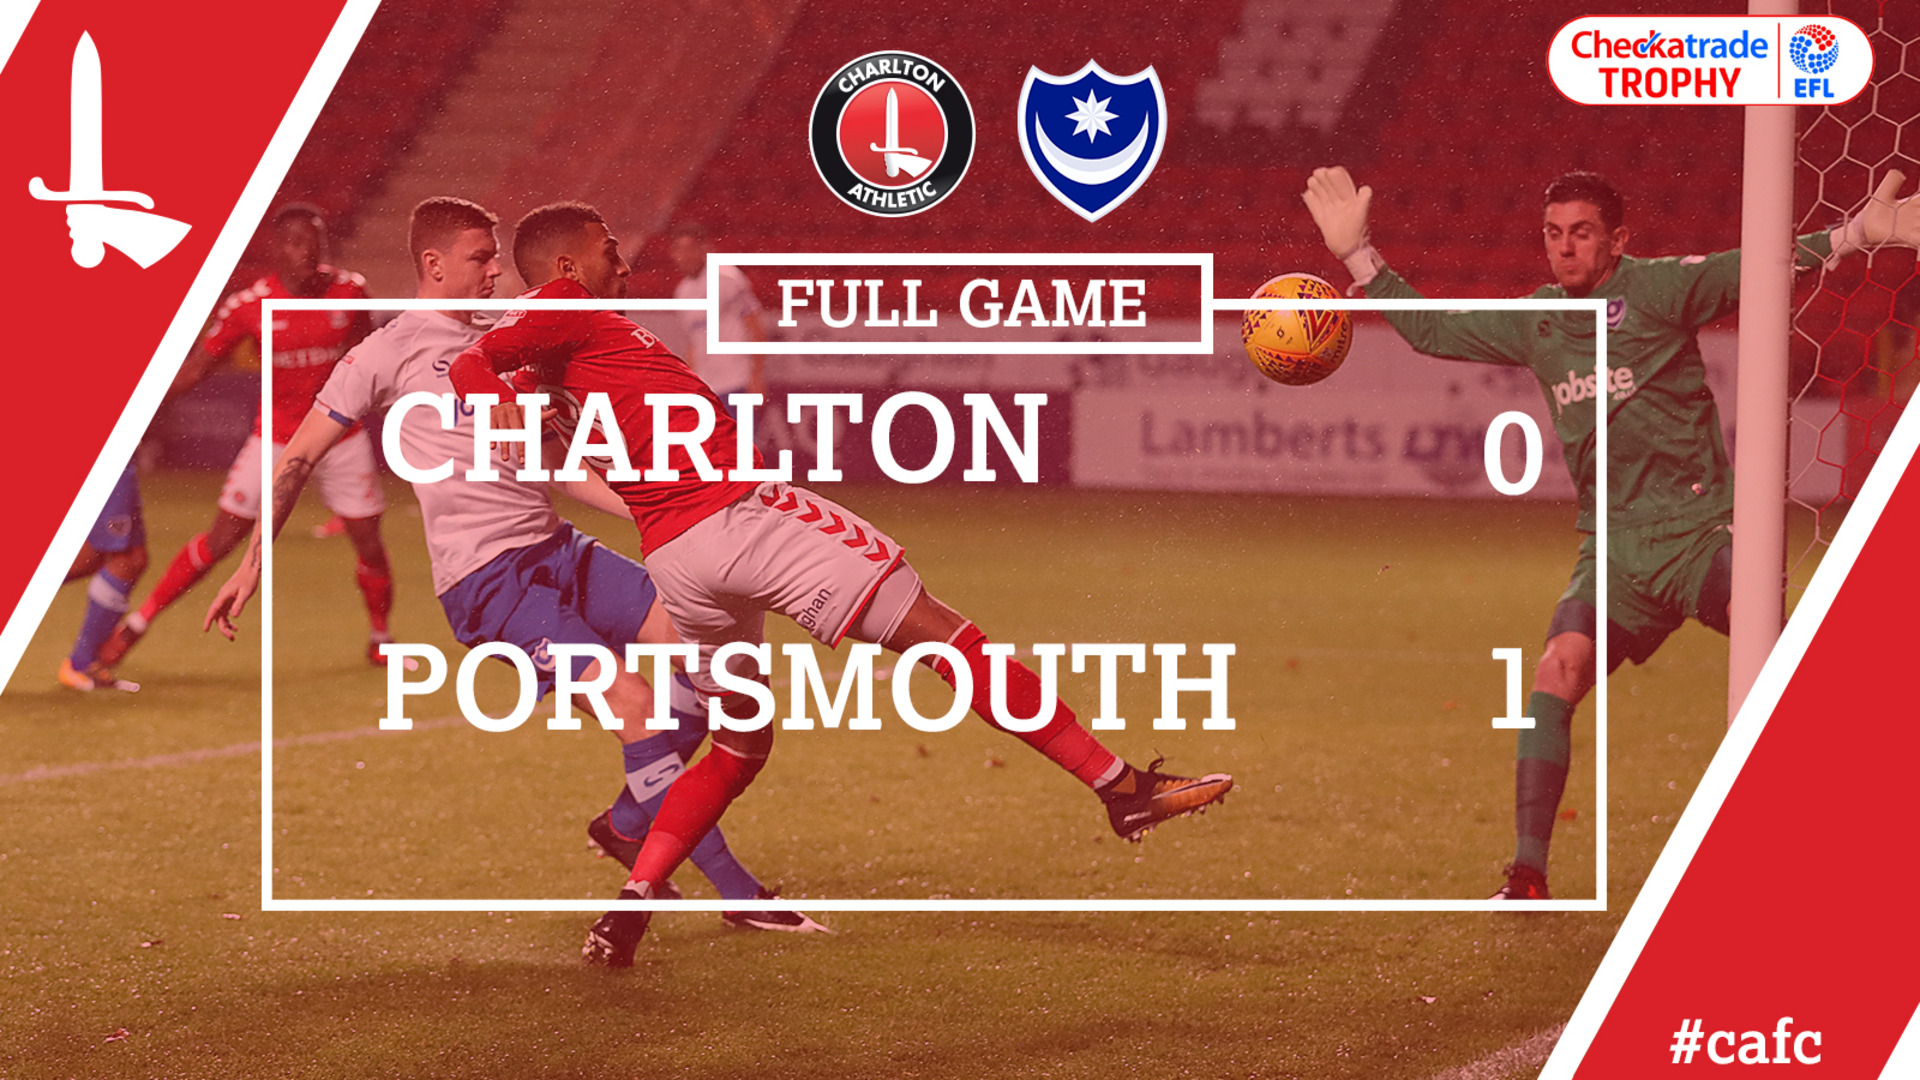 FULL GAME | Charlton 0 Portsmouth 1 (Checkatrade Trophy)